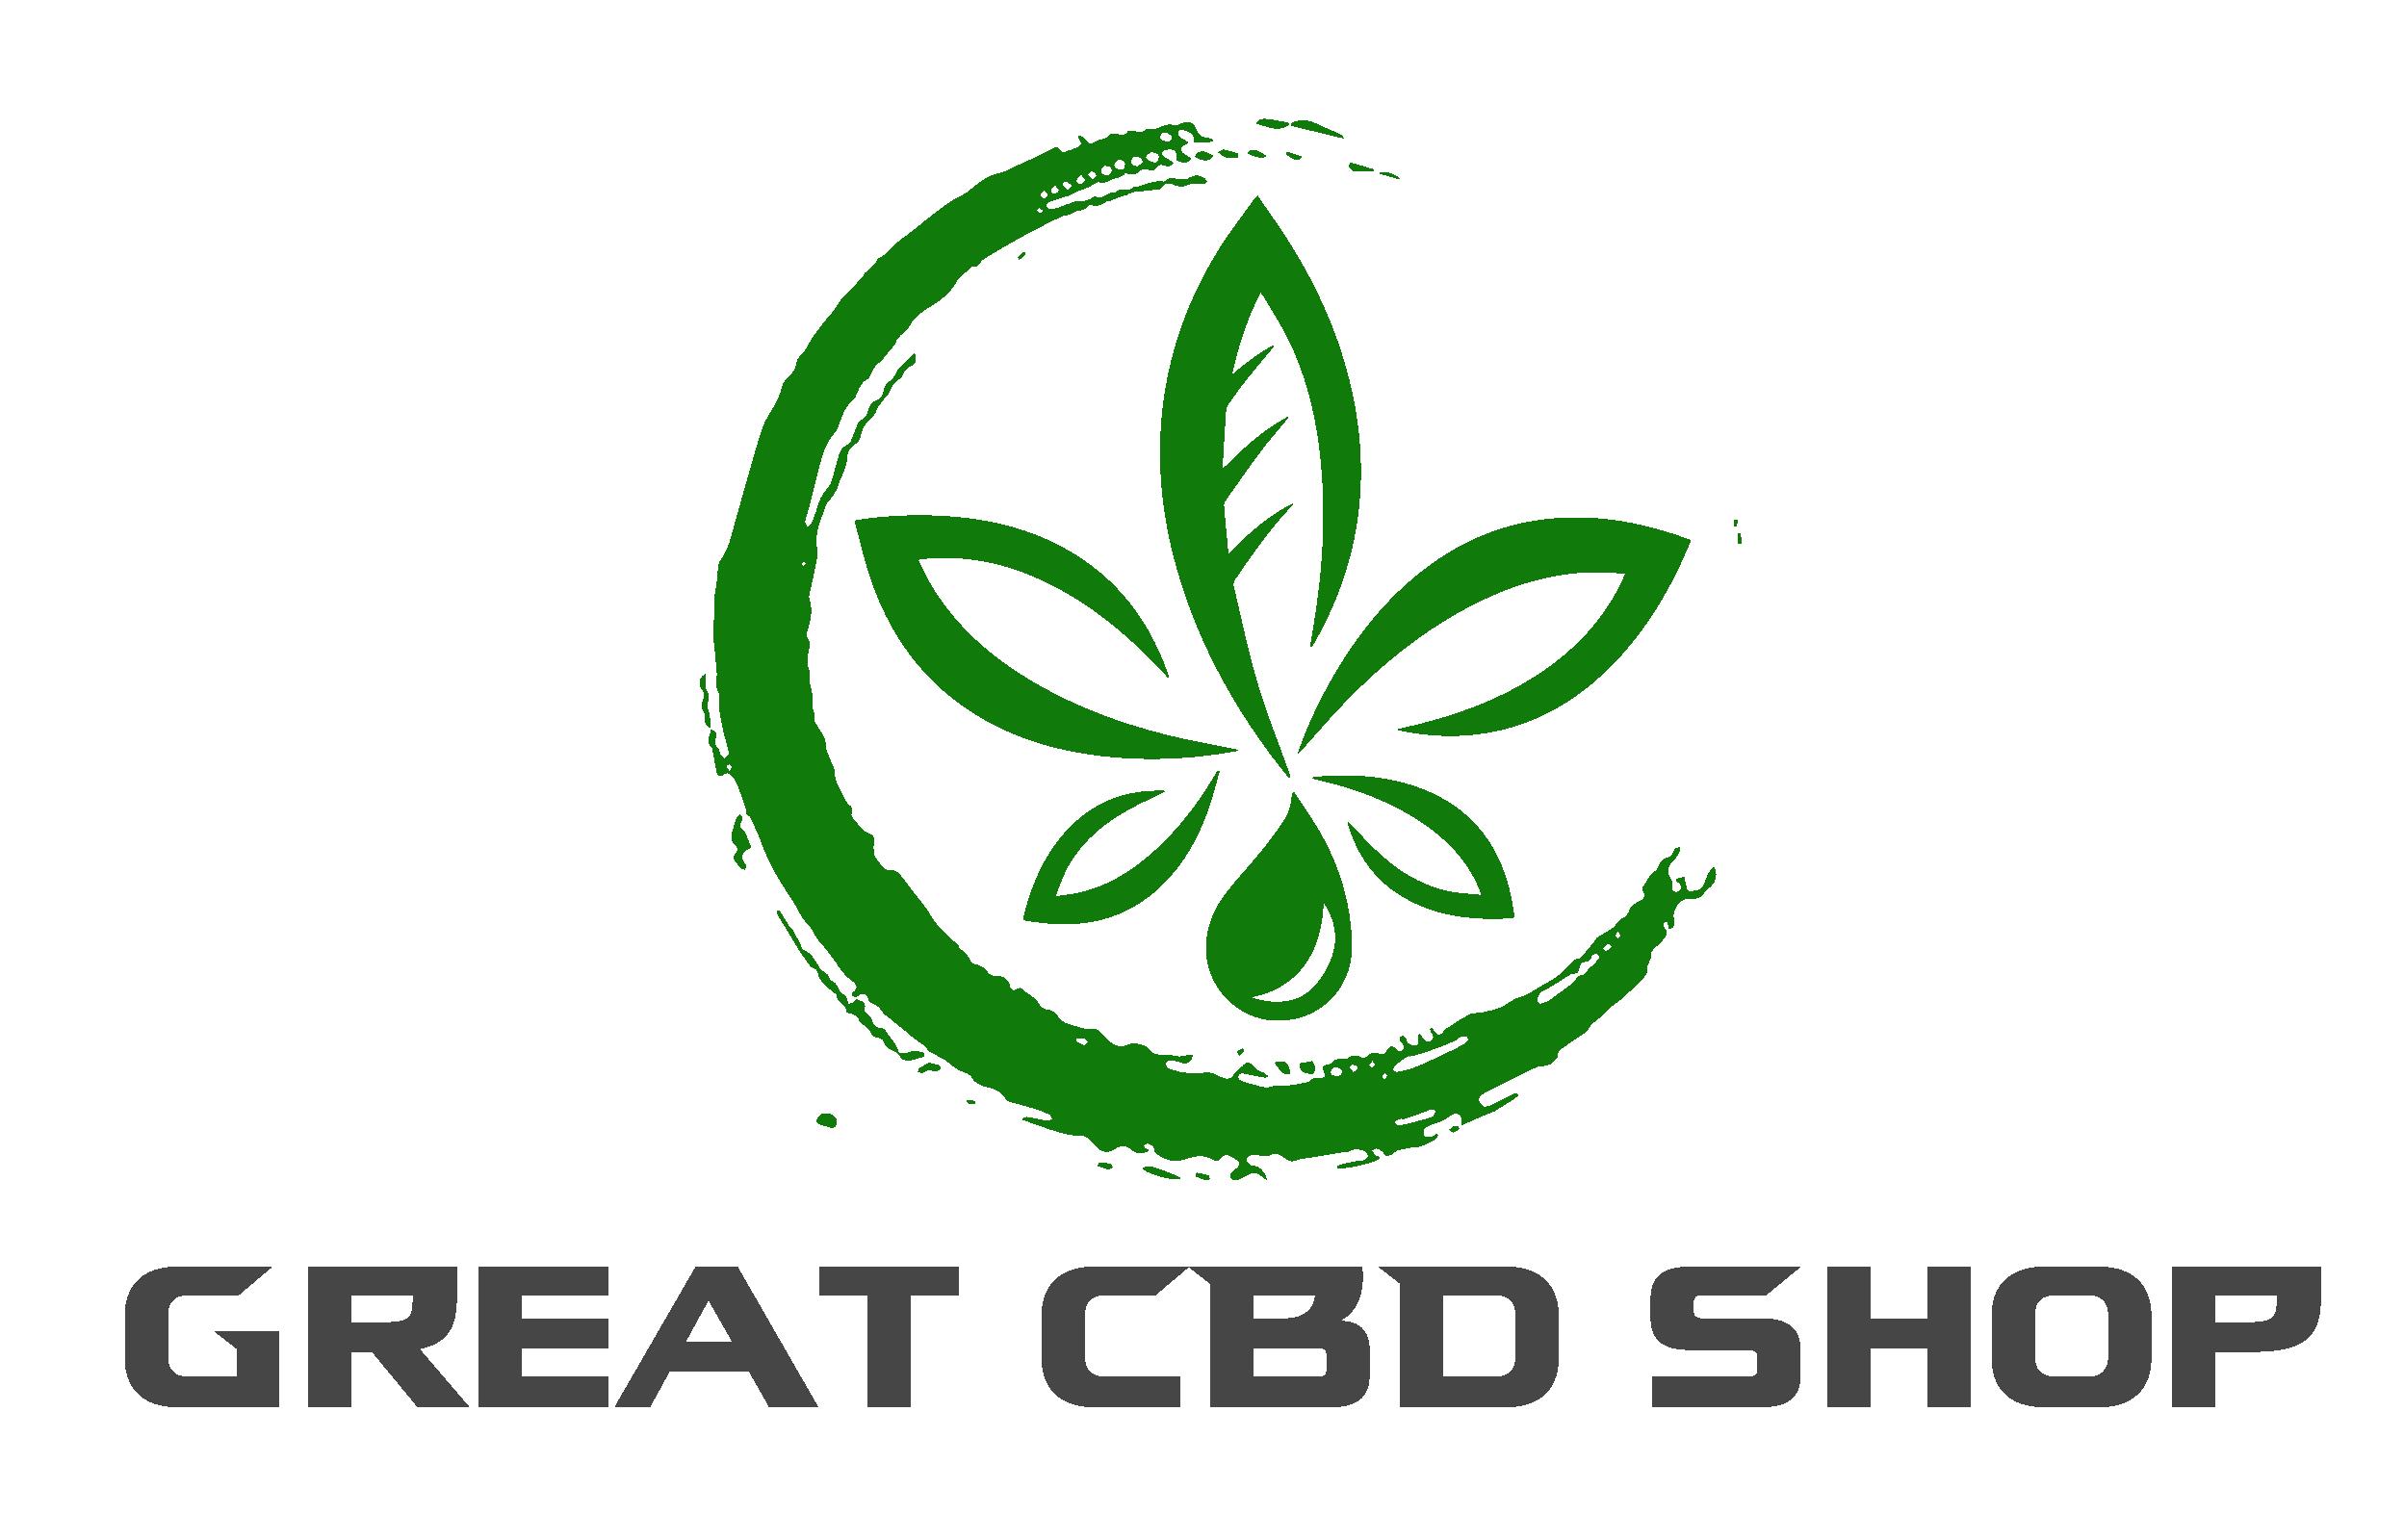 Great CBD Shop